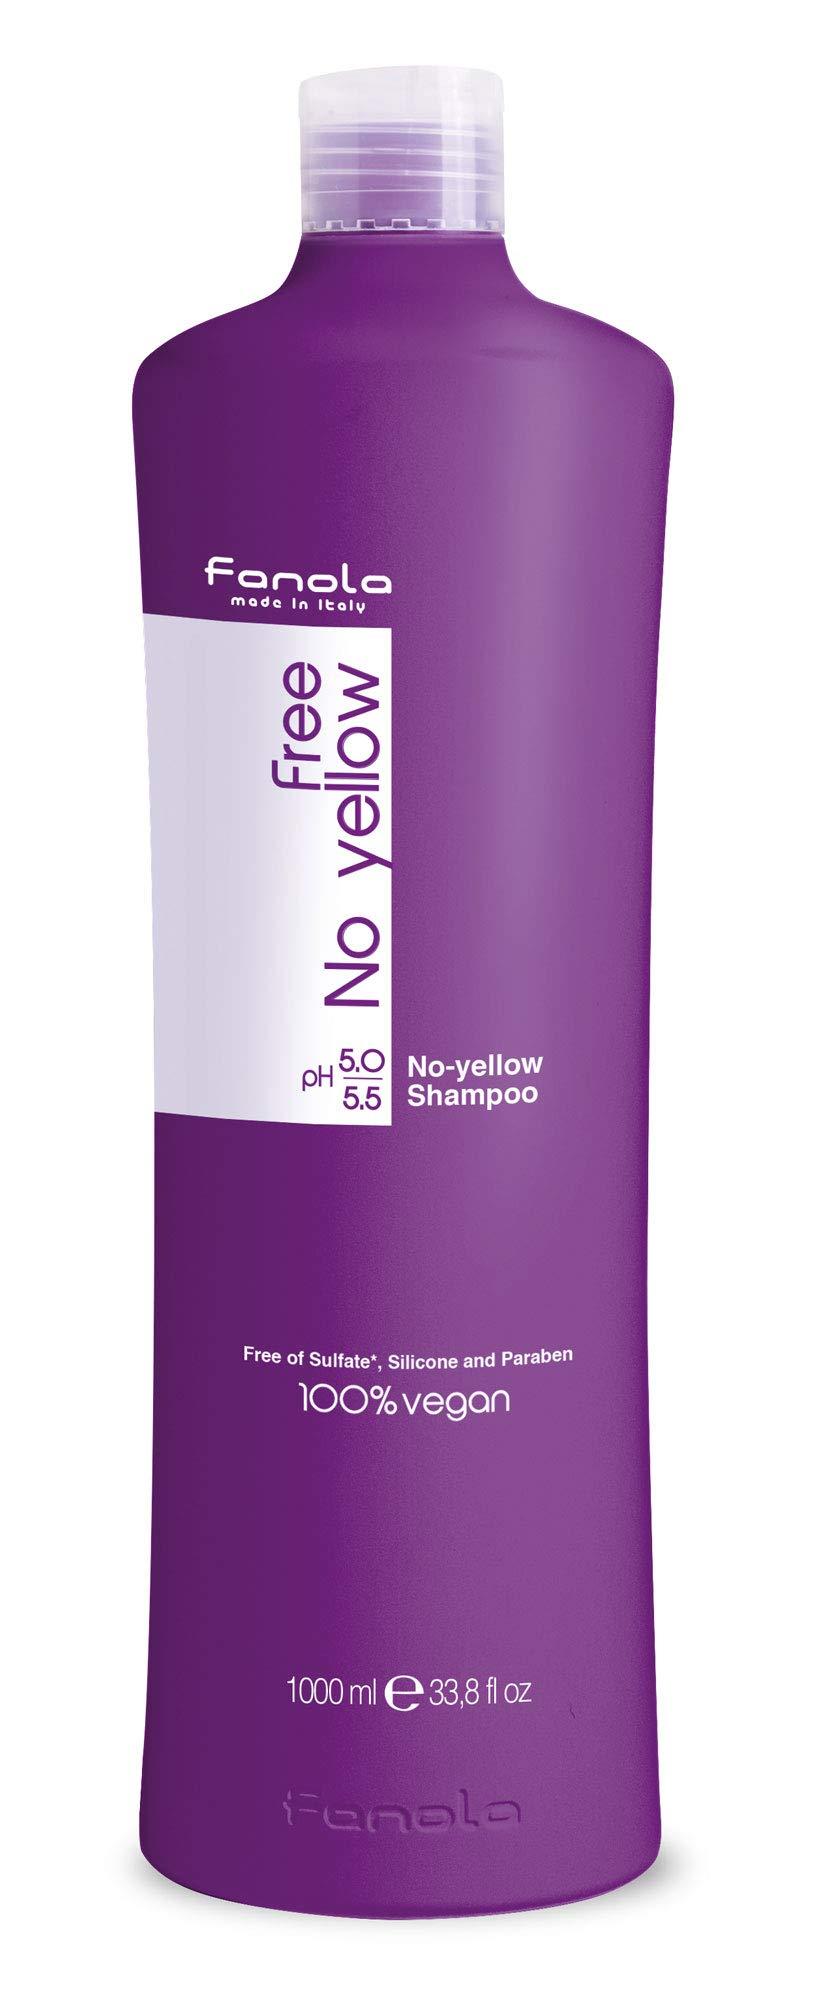 Fanola Free No Yellow Vegan Shampoo, 1000 ml